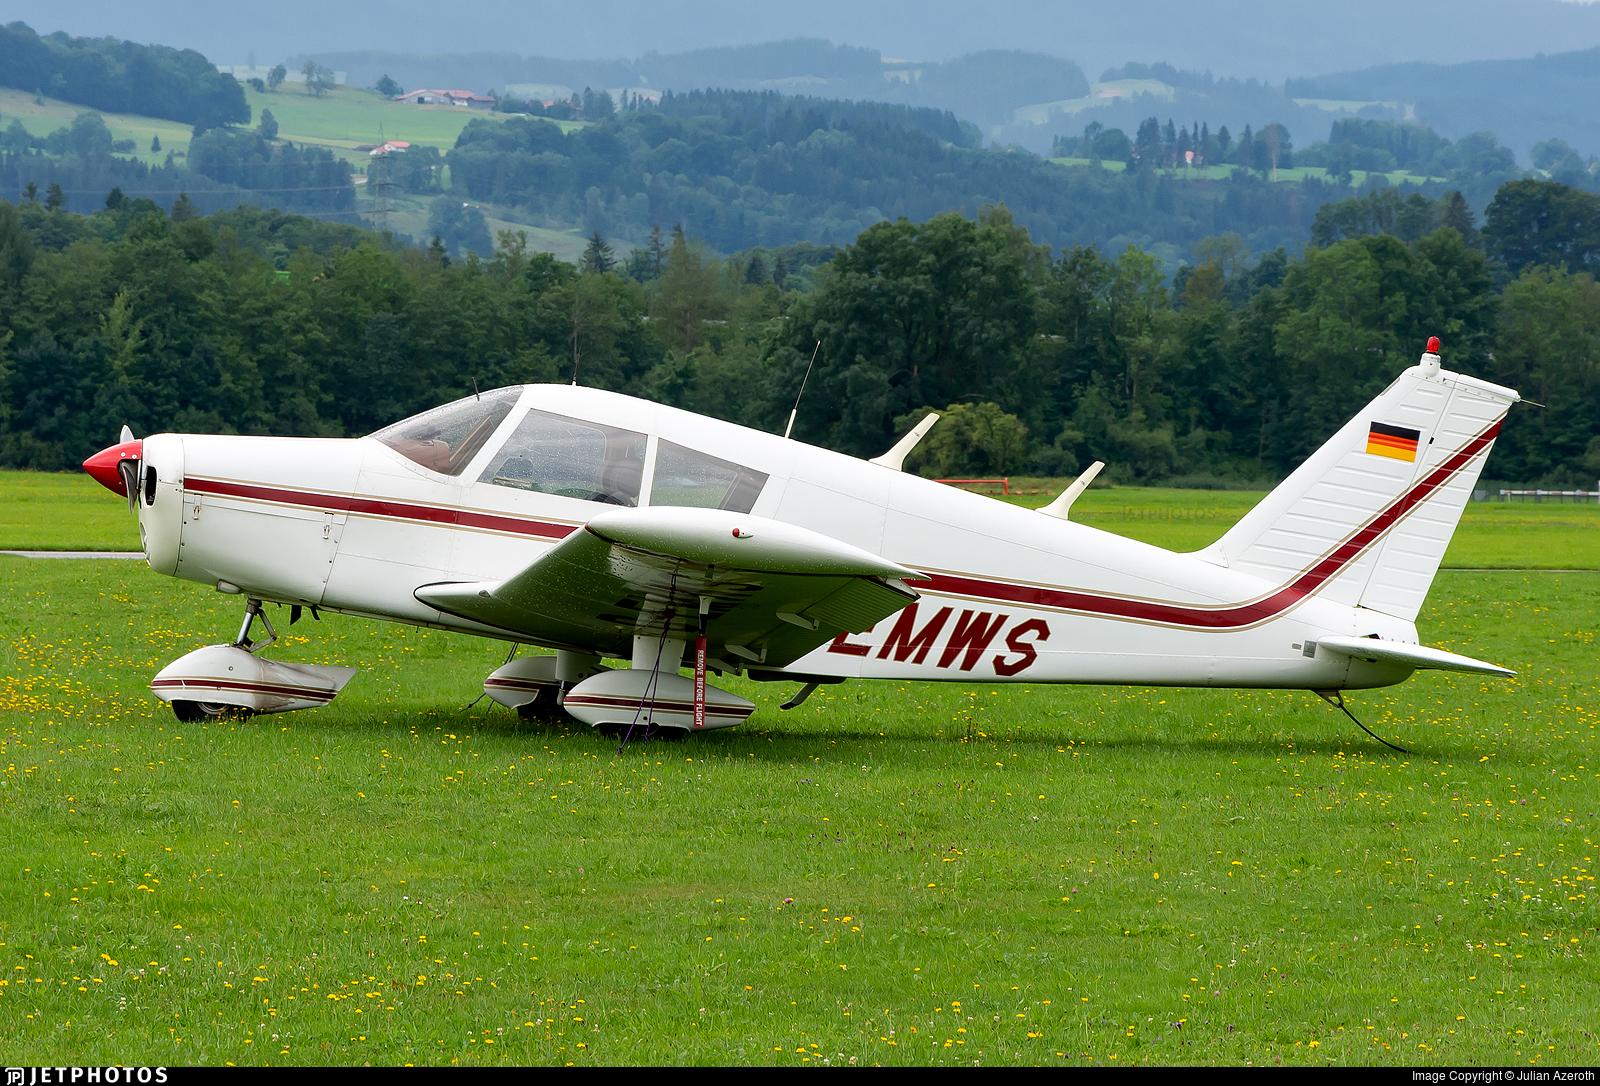 D-EMWS - Piper PA-28-140 Cherokee D - Private